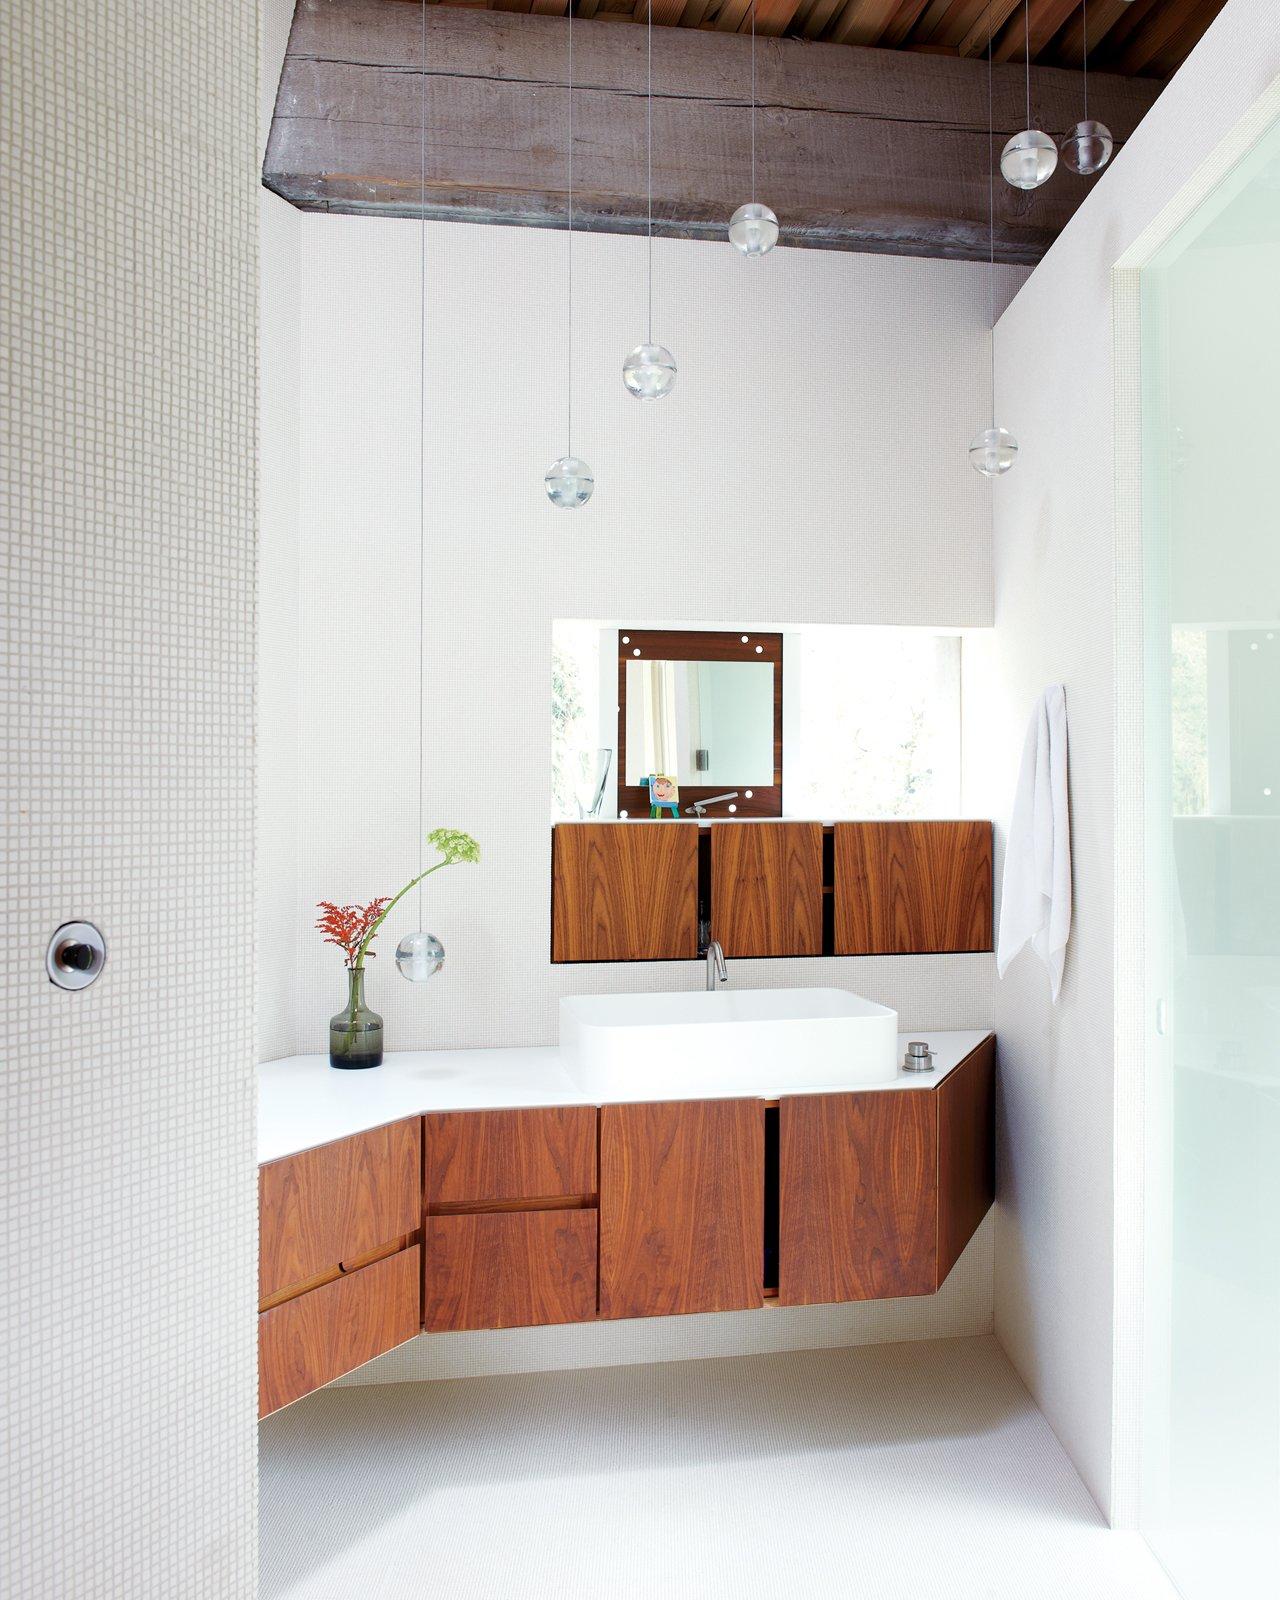 Bath Room, Wood Counter, and Vessel Sink White tiles envelop the en suite master bathroom.   23.2 House by Jordan Kushins